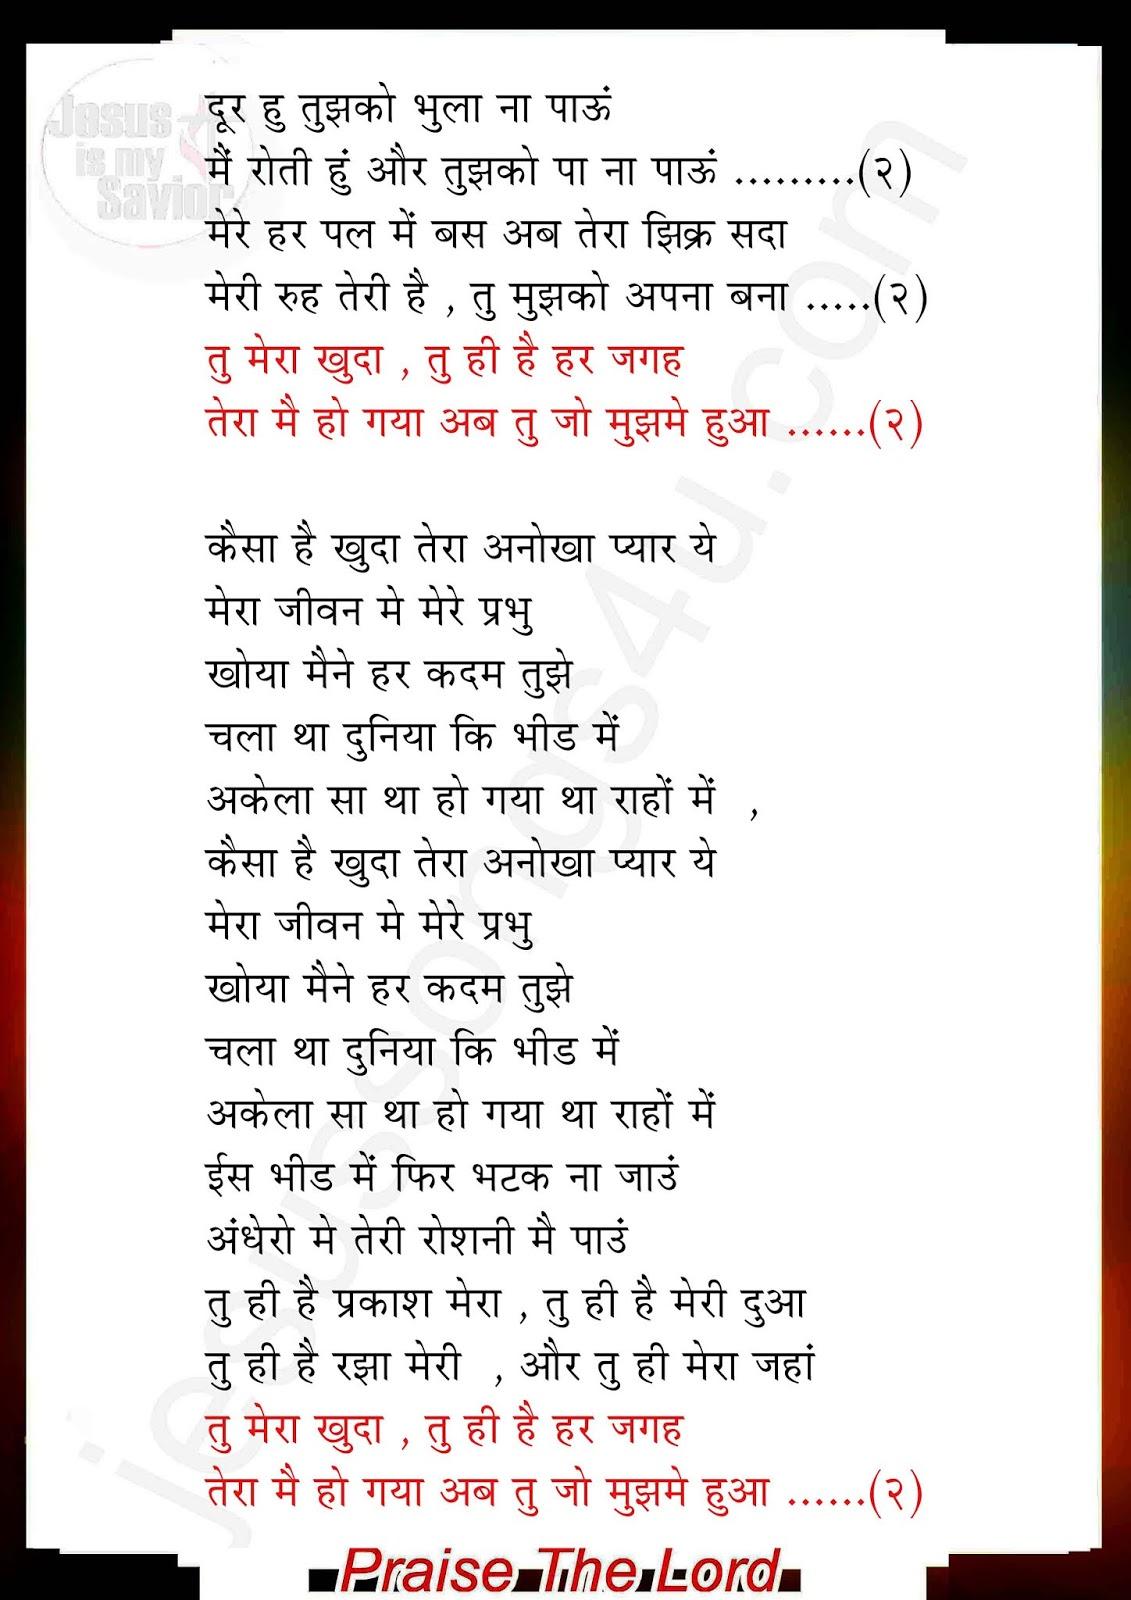 Lyrics Center Lyrics Hindi Songs Raho me kante agar ho , jesus song lyrics hindi राहों में कांटे अगर हो , जीसस सोंग लिरिक्स raho me kante agar ho , rukna. lyrics center lyrics hindi songs